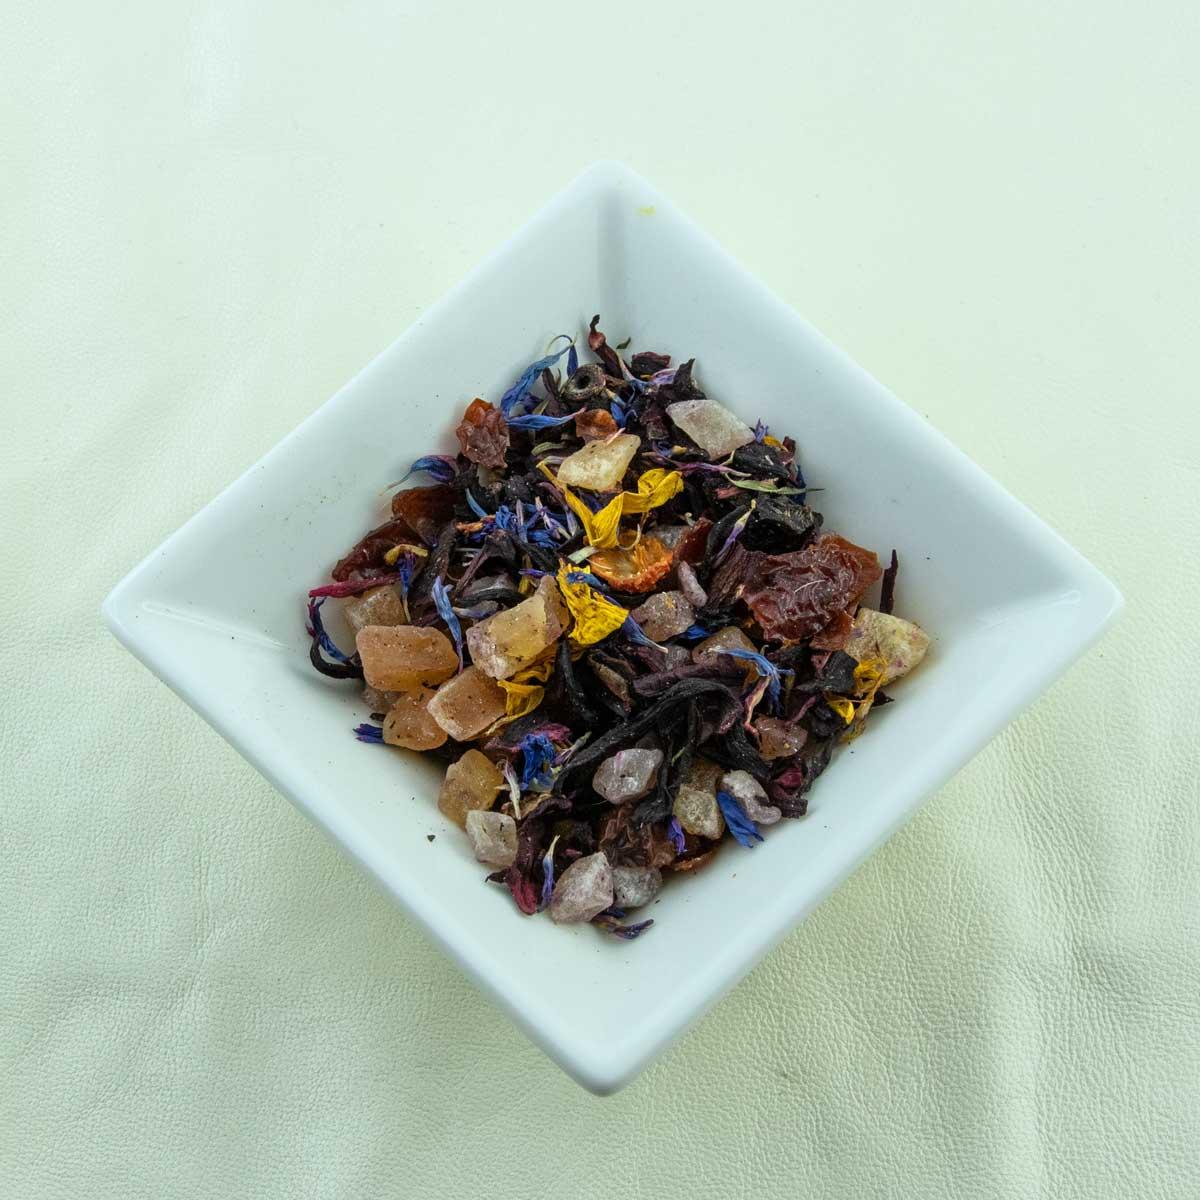 Sommerzauber Pure Fruit 100g